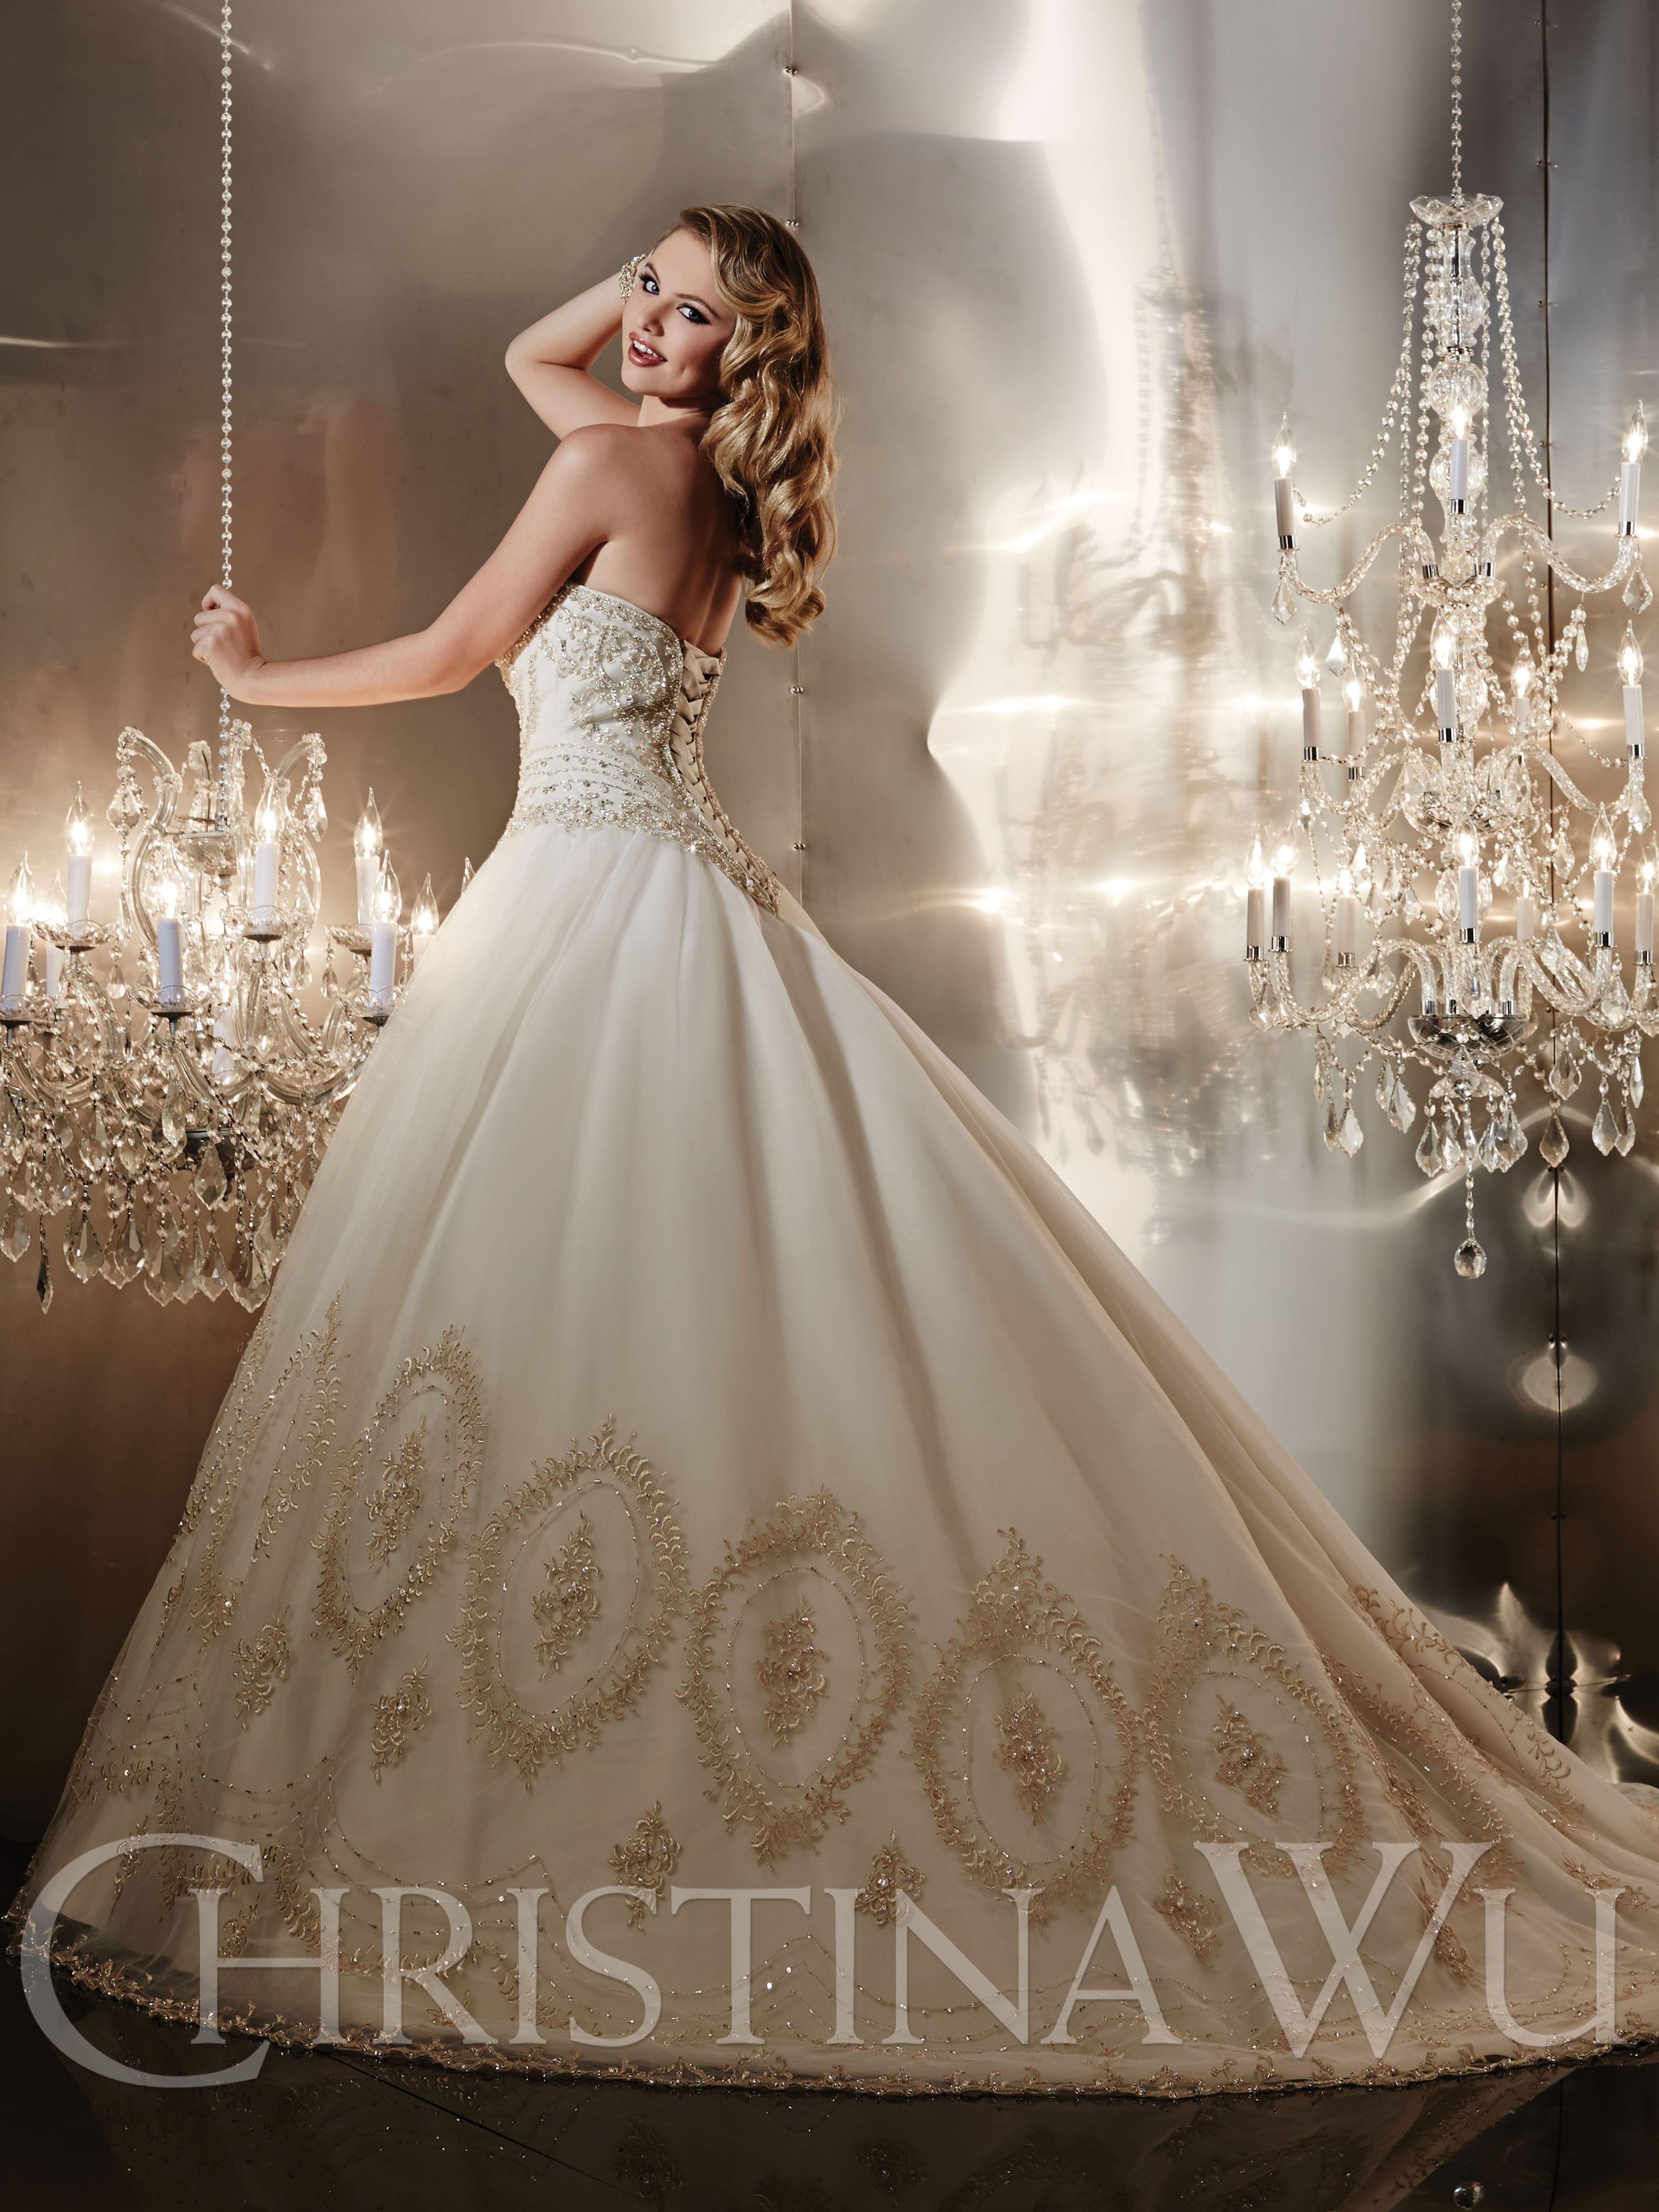 Christina wu wedding dresses  Christina Wu Style   Wedding gowns  Pinterest  Christina wu